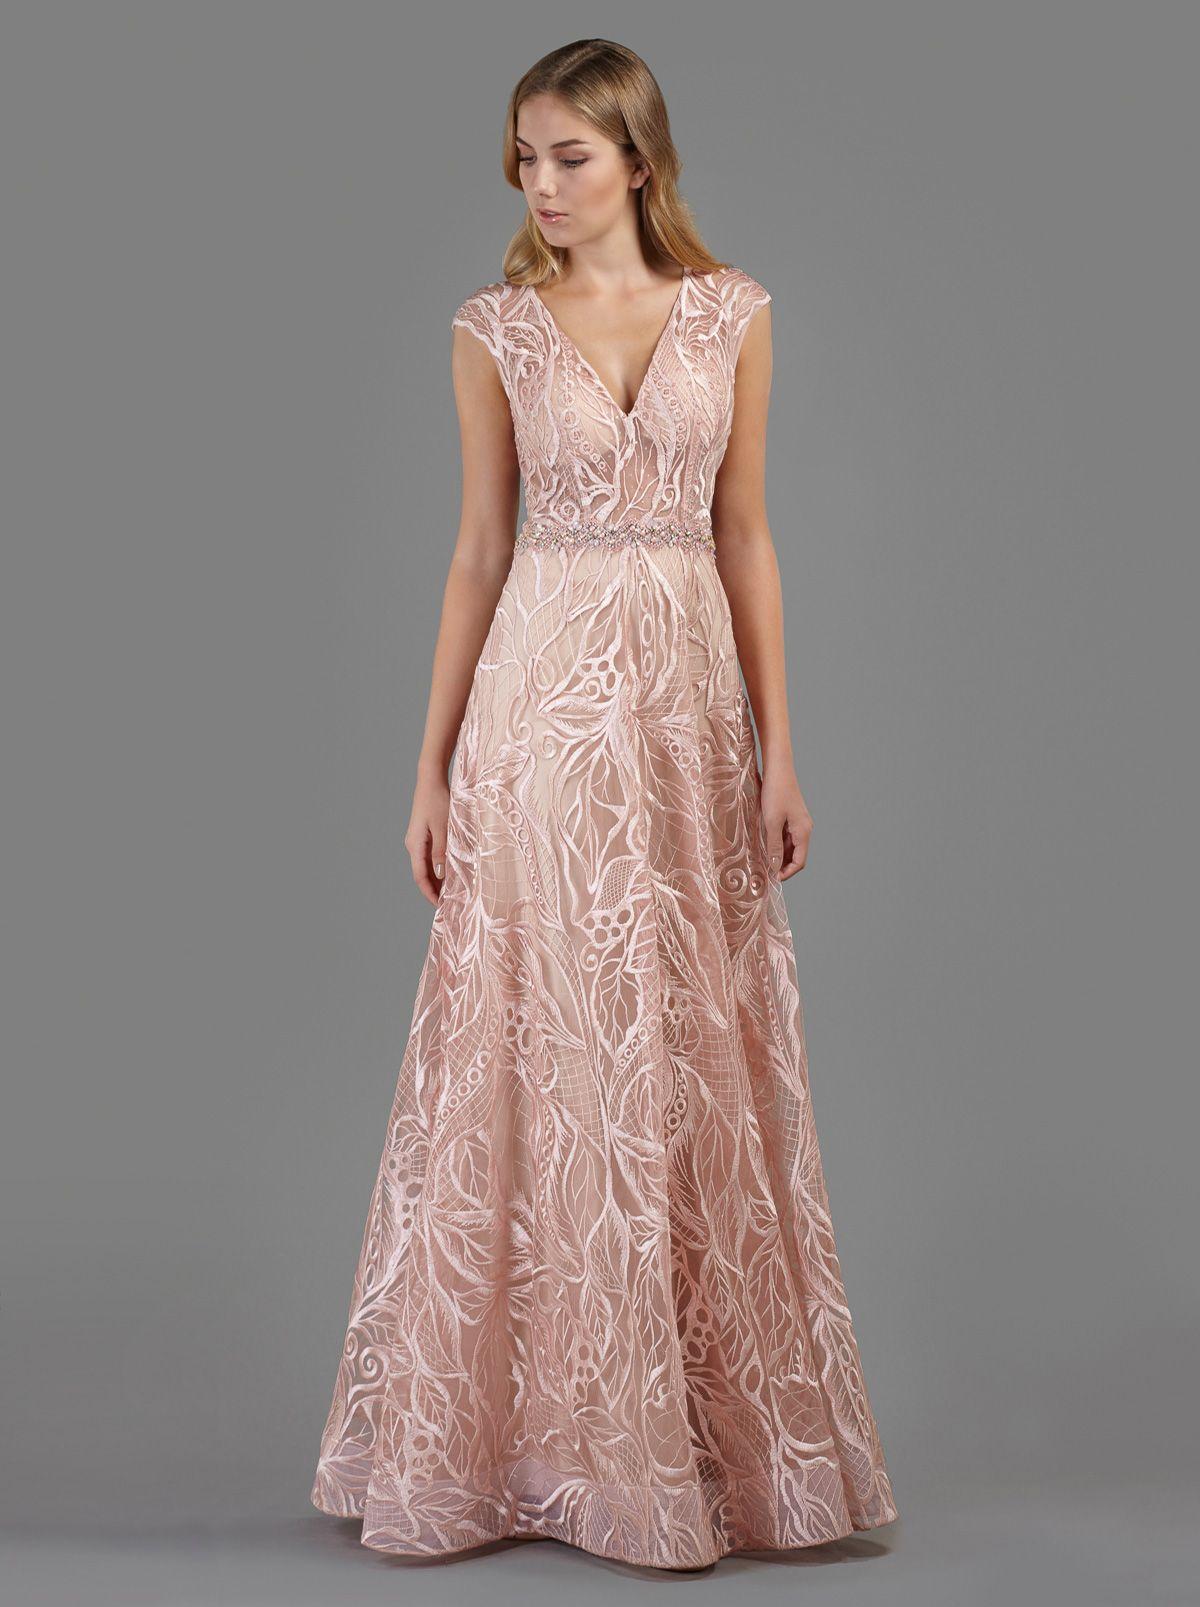 e87e87d3a89a Αποτέλεσμα εικόνας για πατρον για φορεμα σε ισια γραμμη